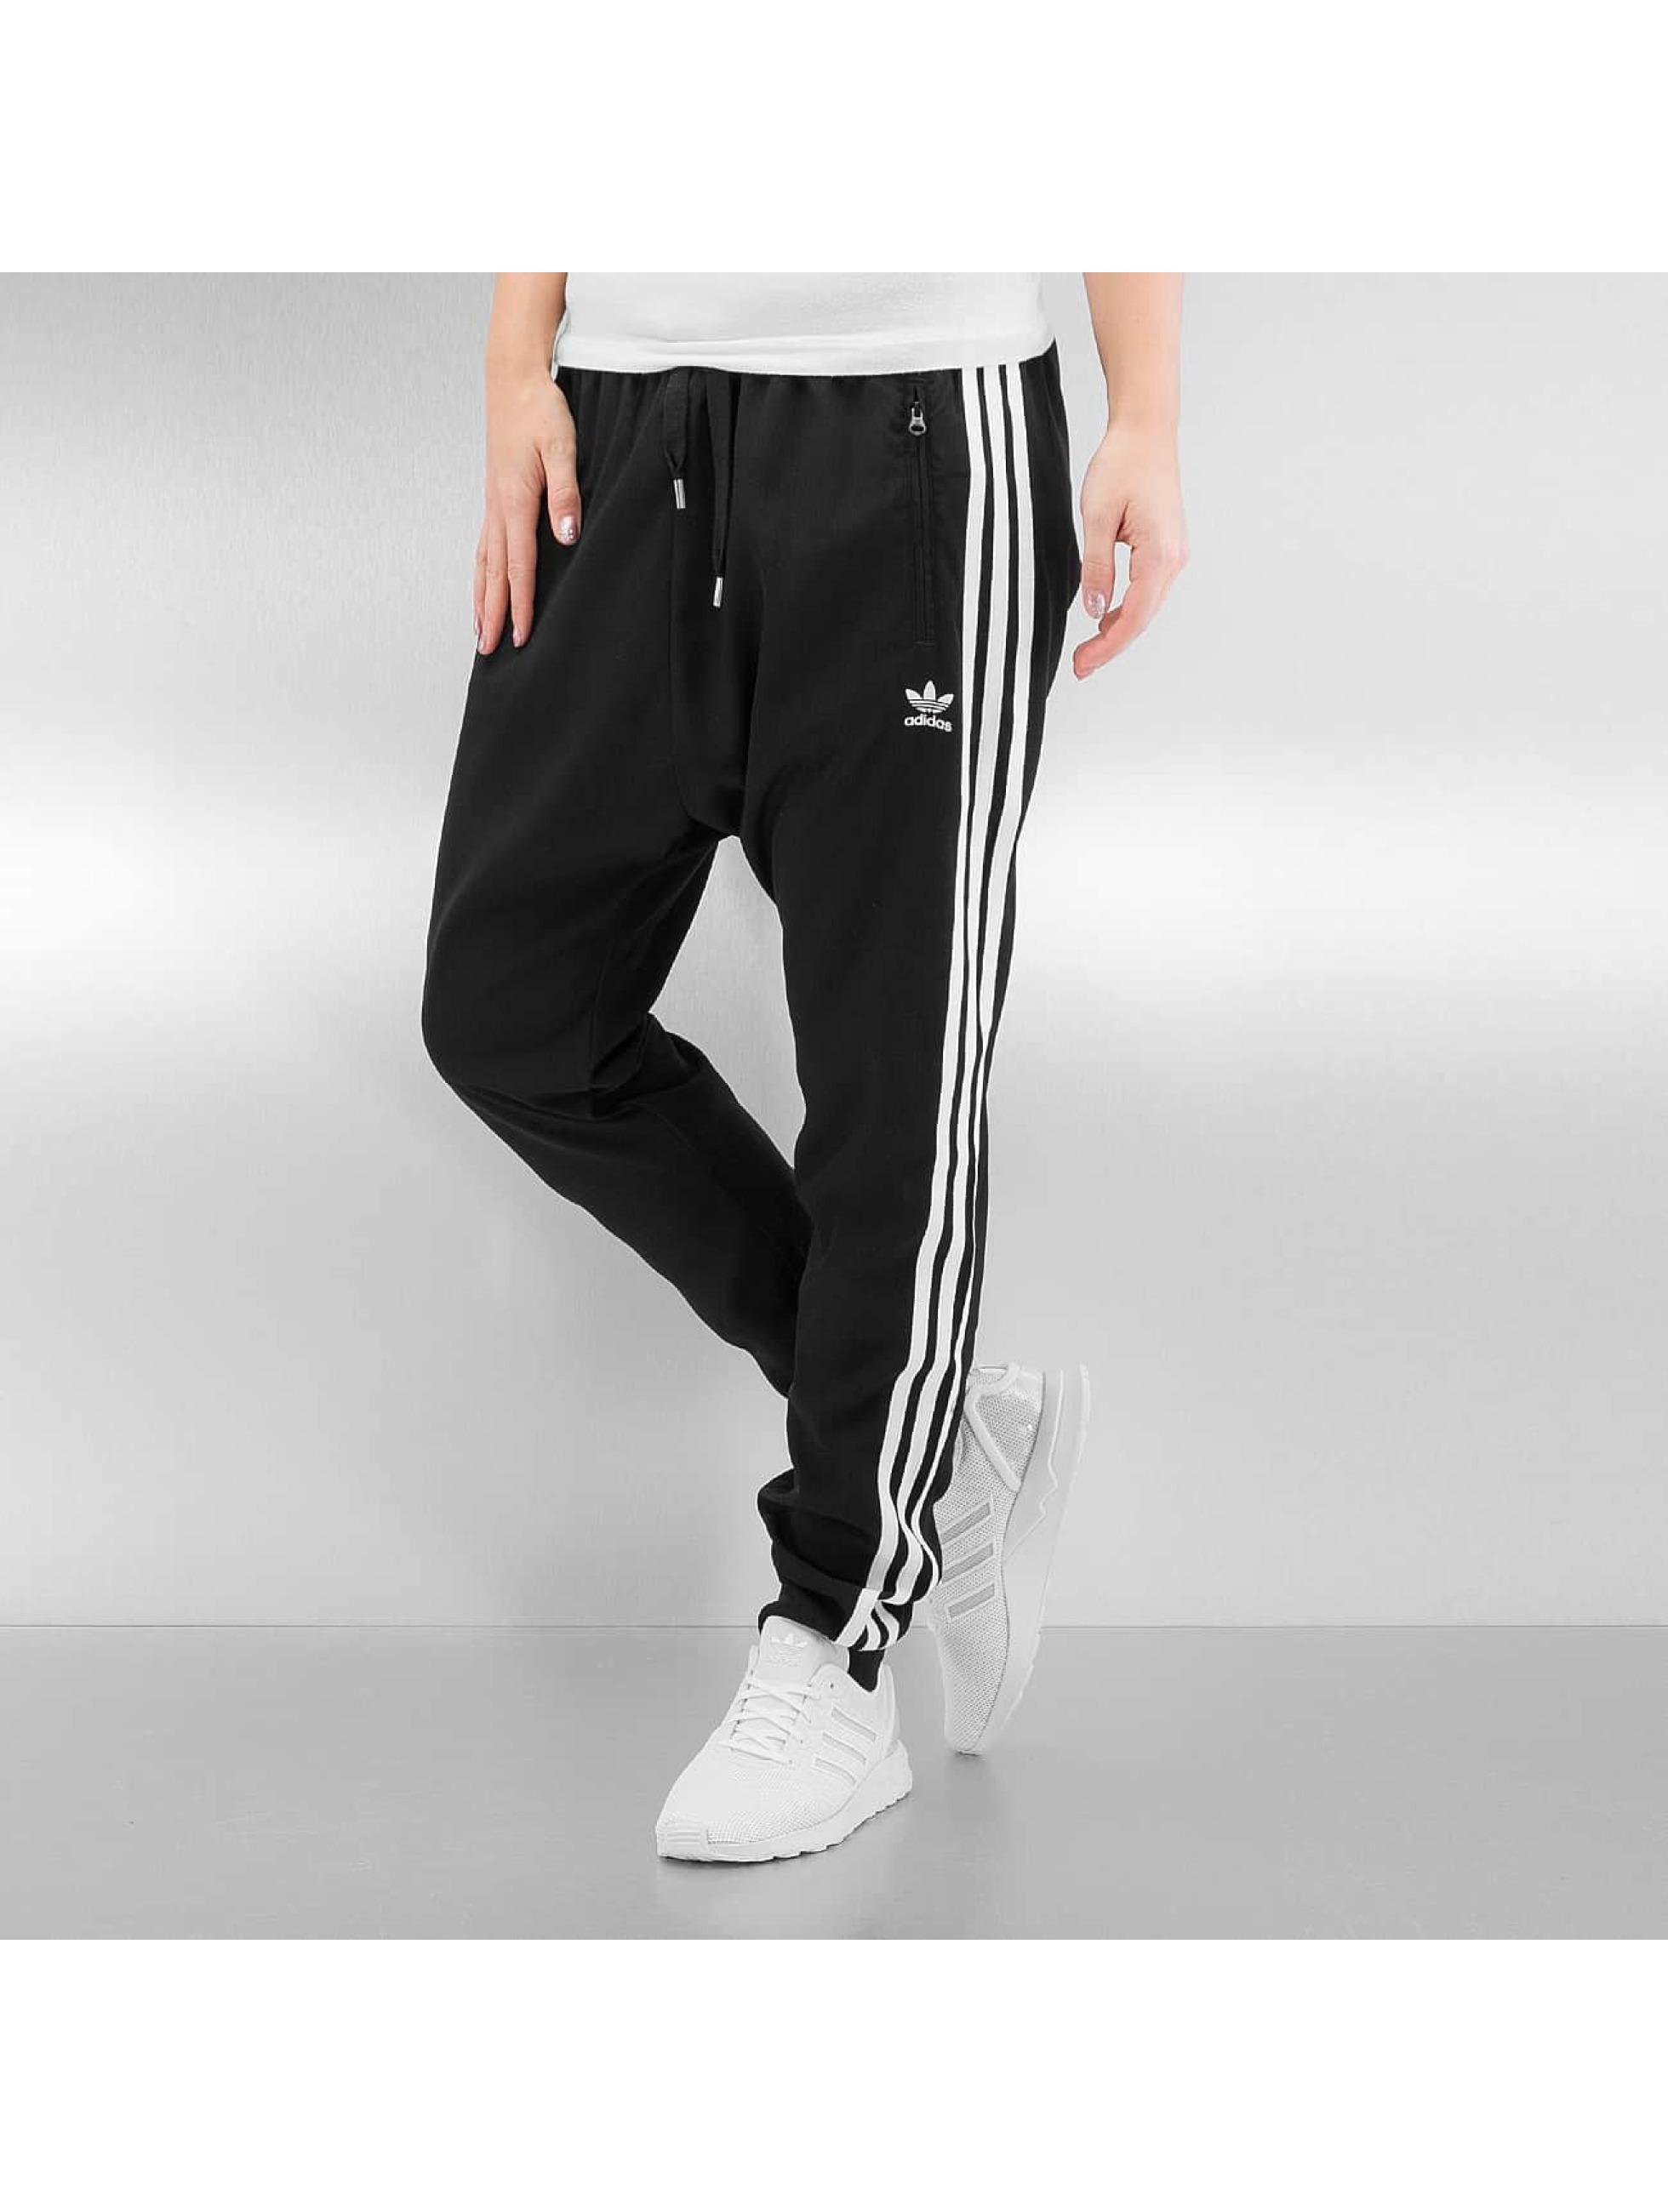 Jogginghose Low Crotch in schwarz